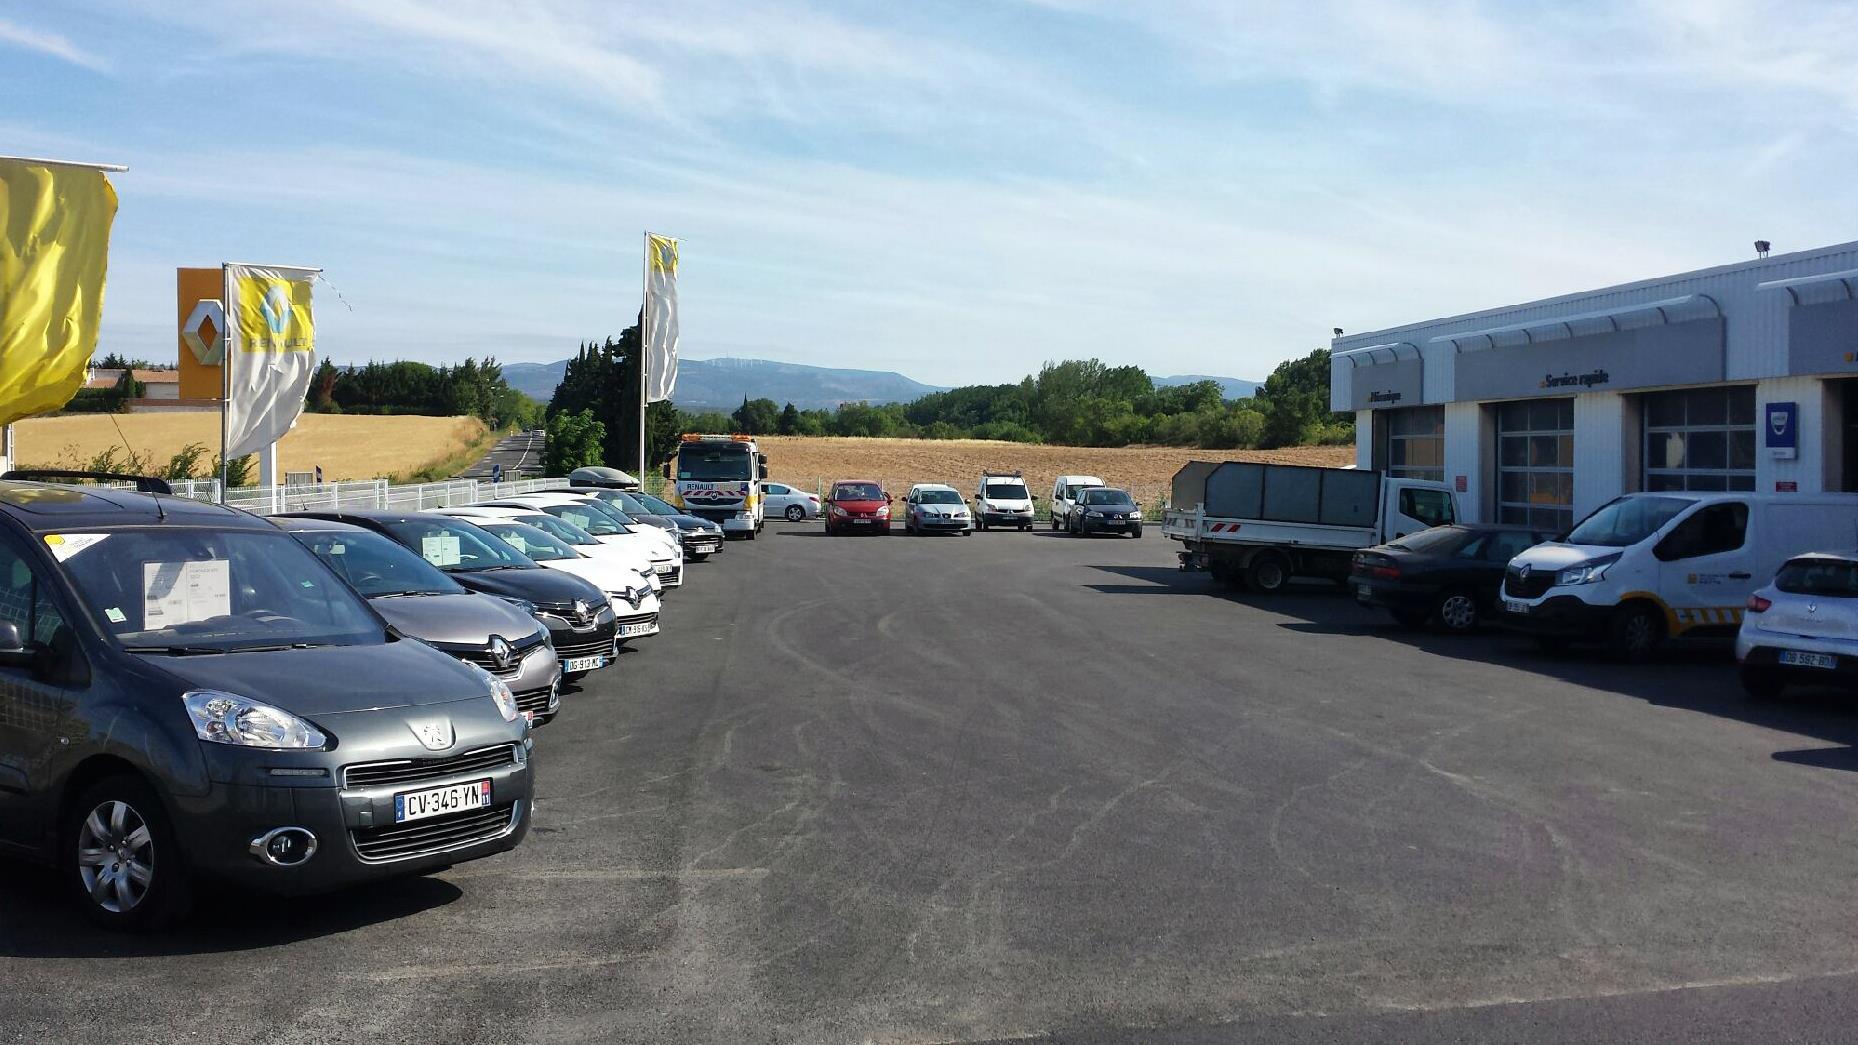 V hicules neufs occasions garage daries garage automobile carcassonne - Garage nissan carcassonne ...